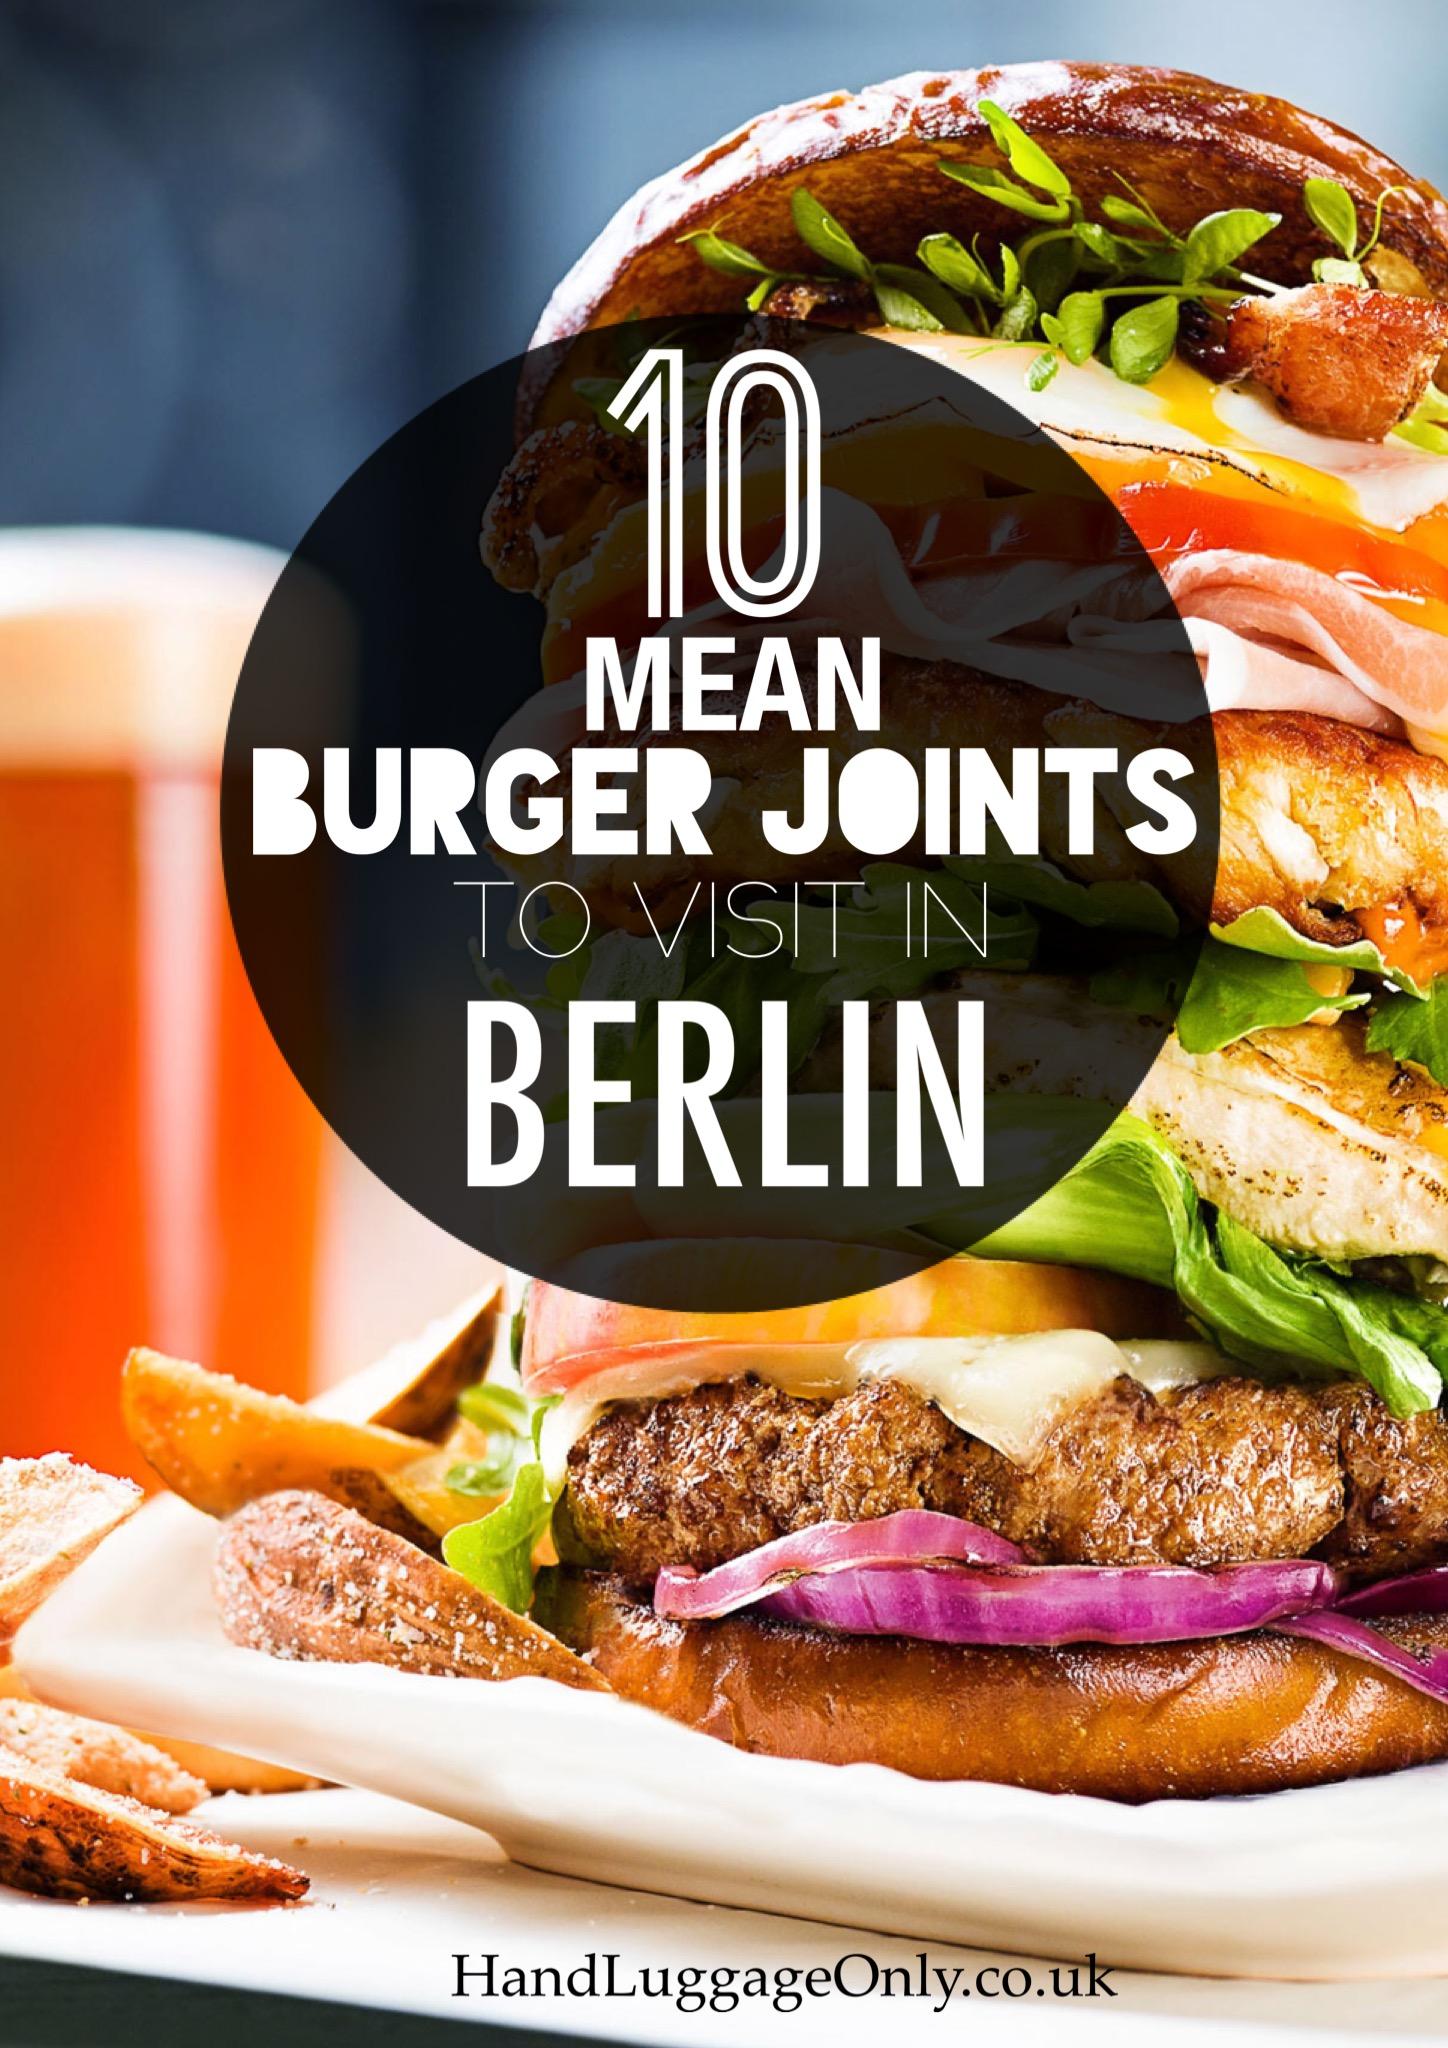 10 BURGER RESTAURANTS YOU HAVE TO VISIT IN BERLIN!